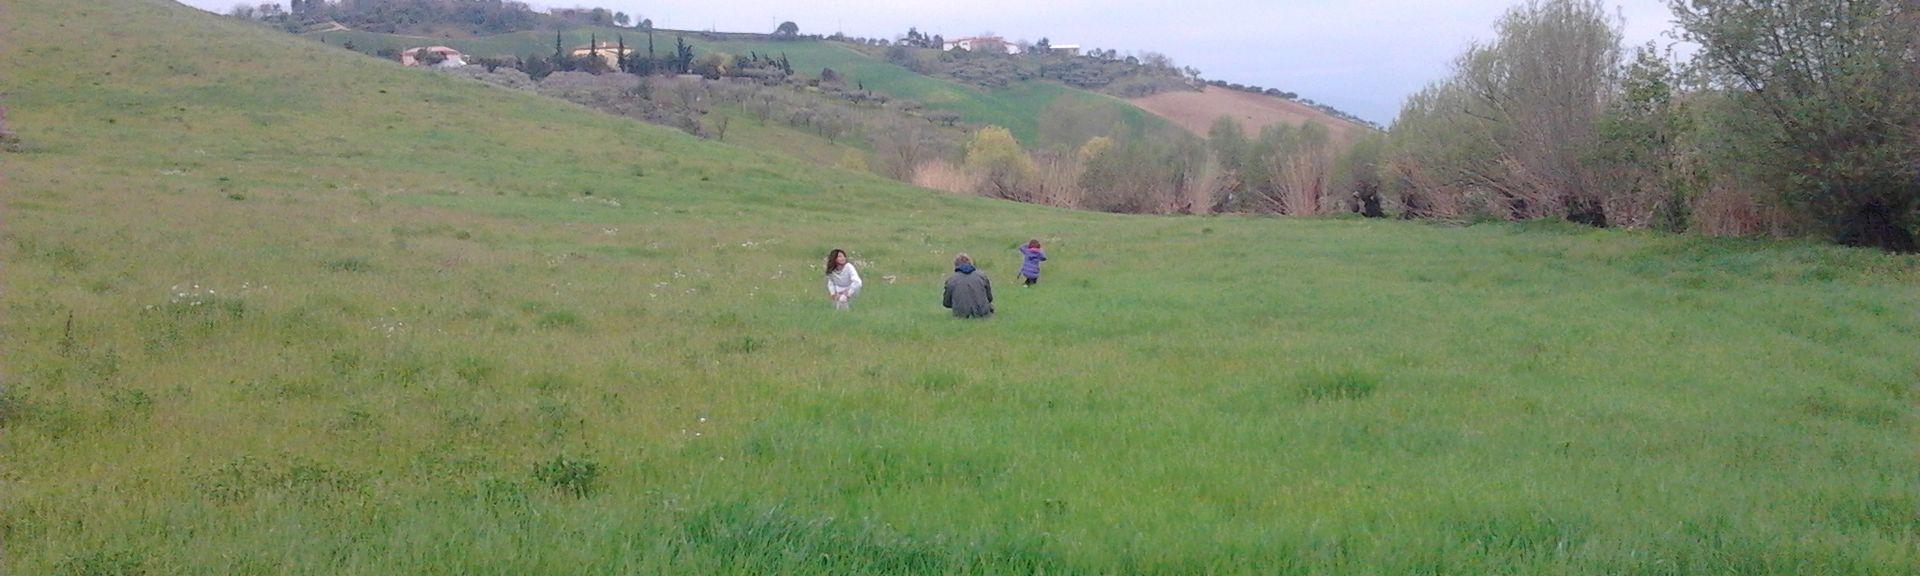 Fonte Umano-san Martino Alta, Pescara, Abruzzo, Italy